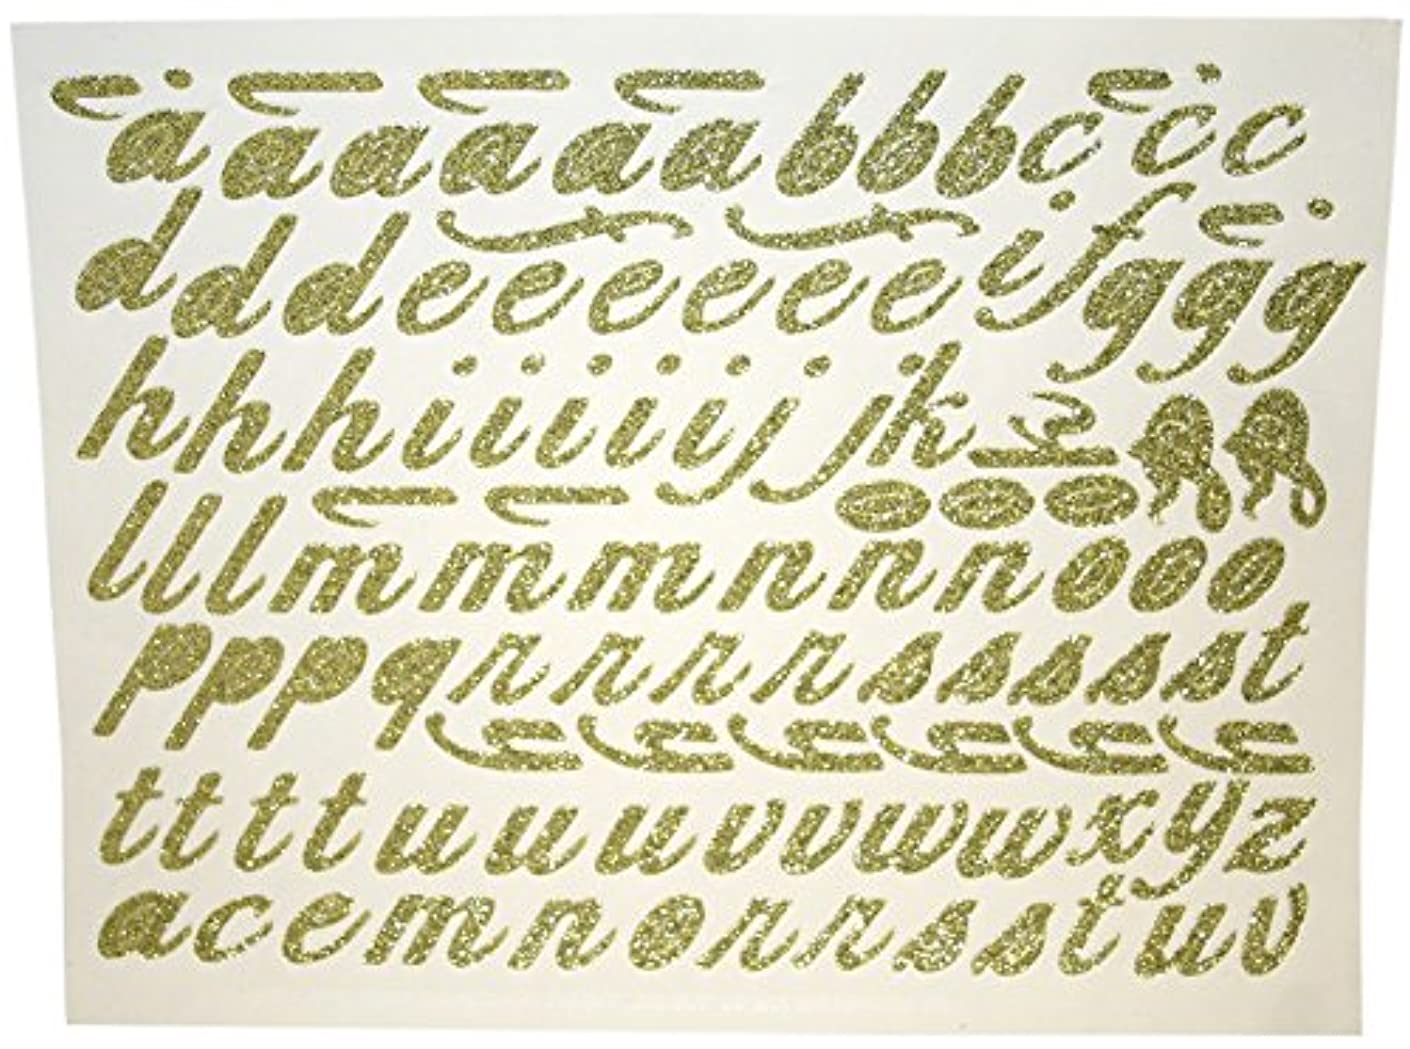 Reliant Ribbon Script Word Std Rd Ribbon, 1 Piece, Gold